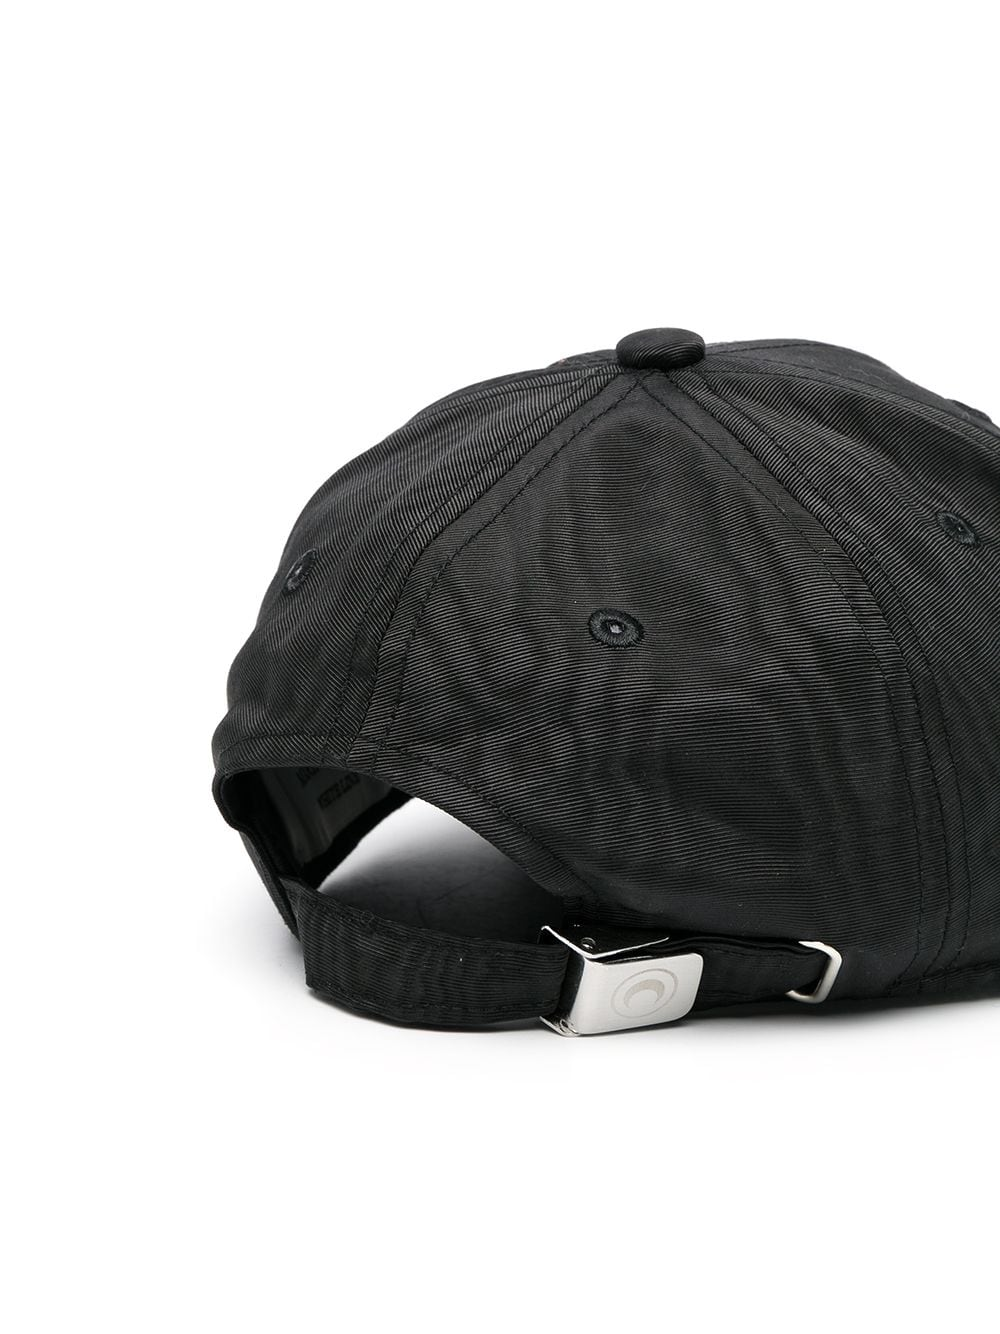 logo hat unisex black MARINE SERRE | Hats | A008ICONX00